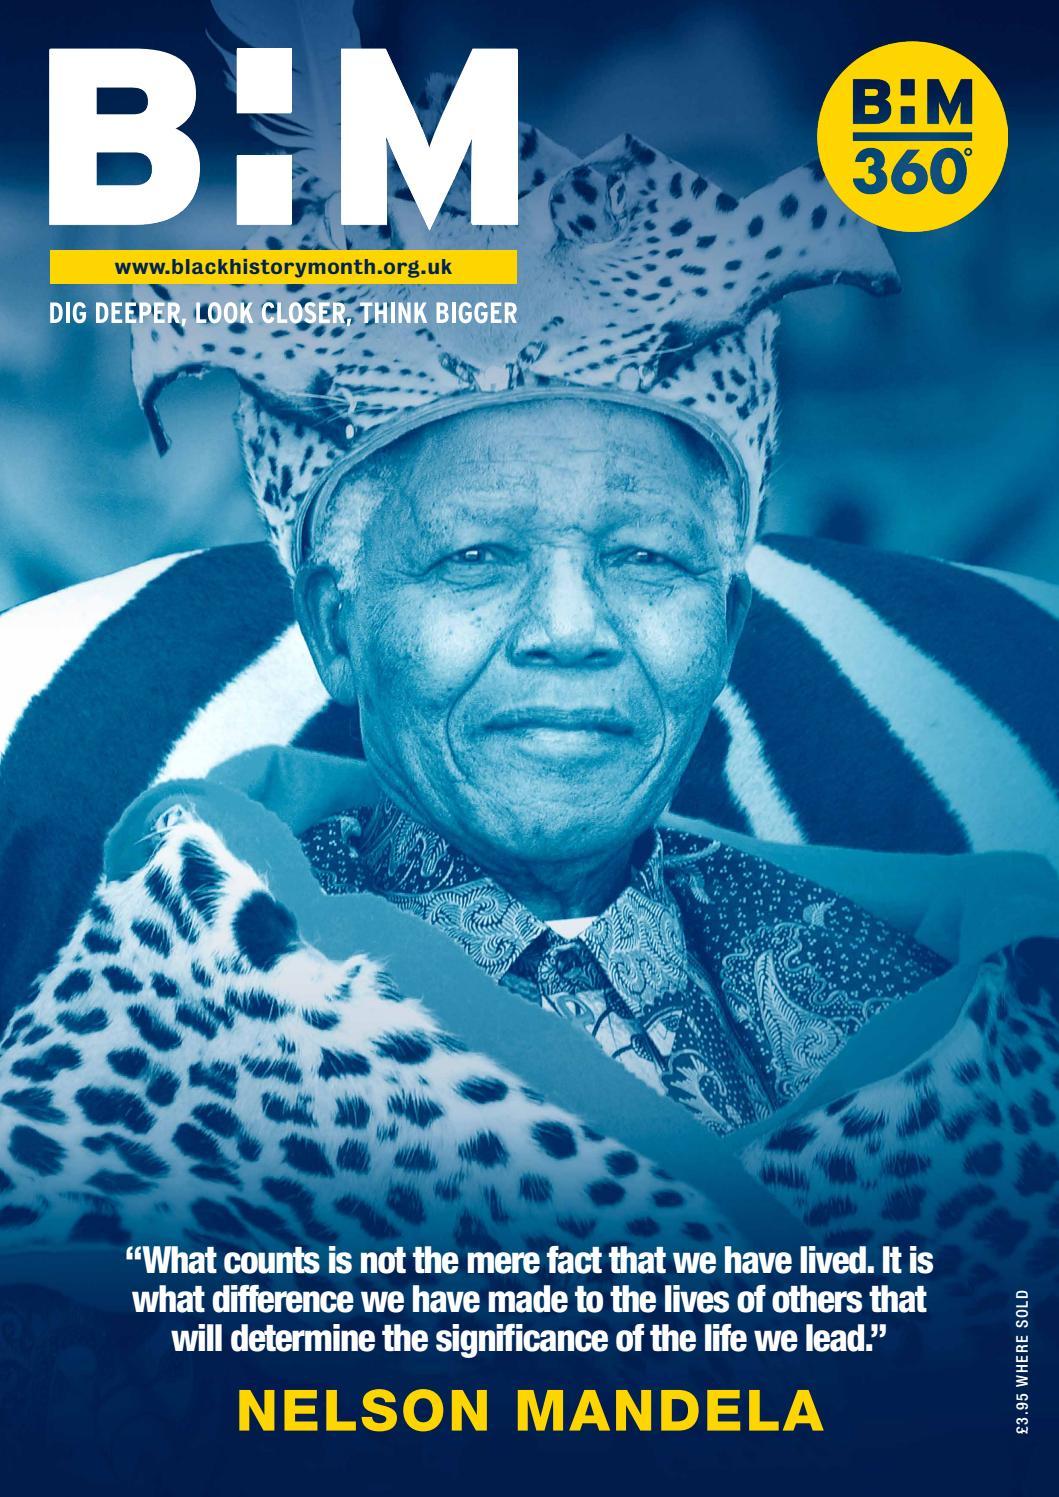 7dc1c51522cc4f Black History Month Magazine 2018 by Sugar Media and Marketing - issuu